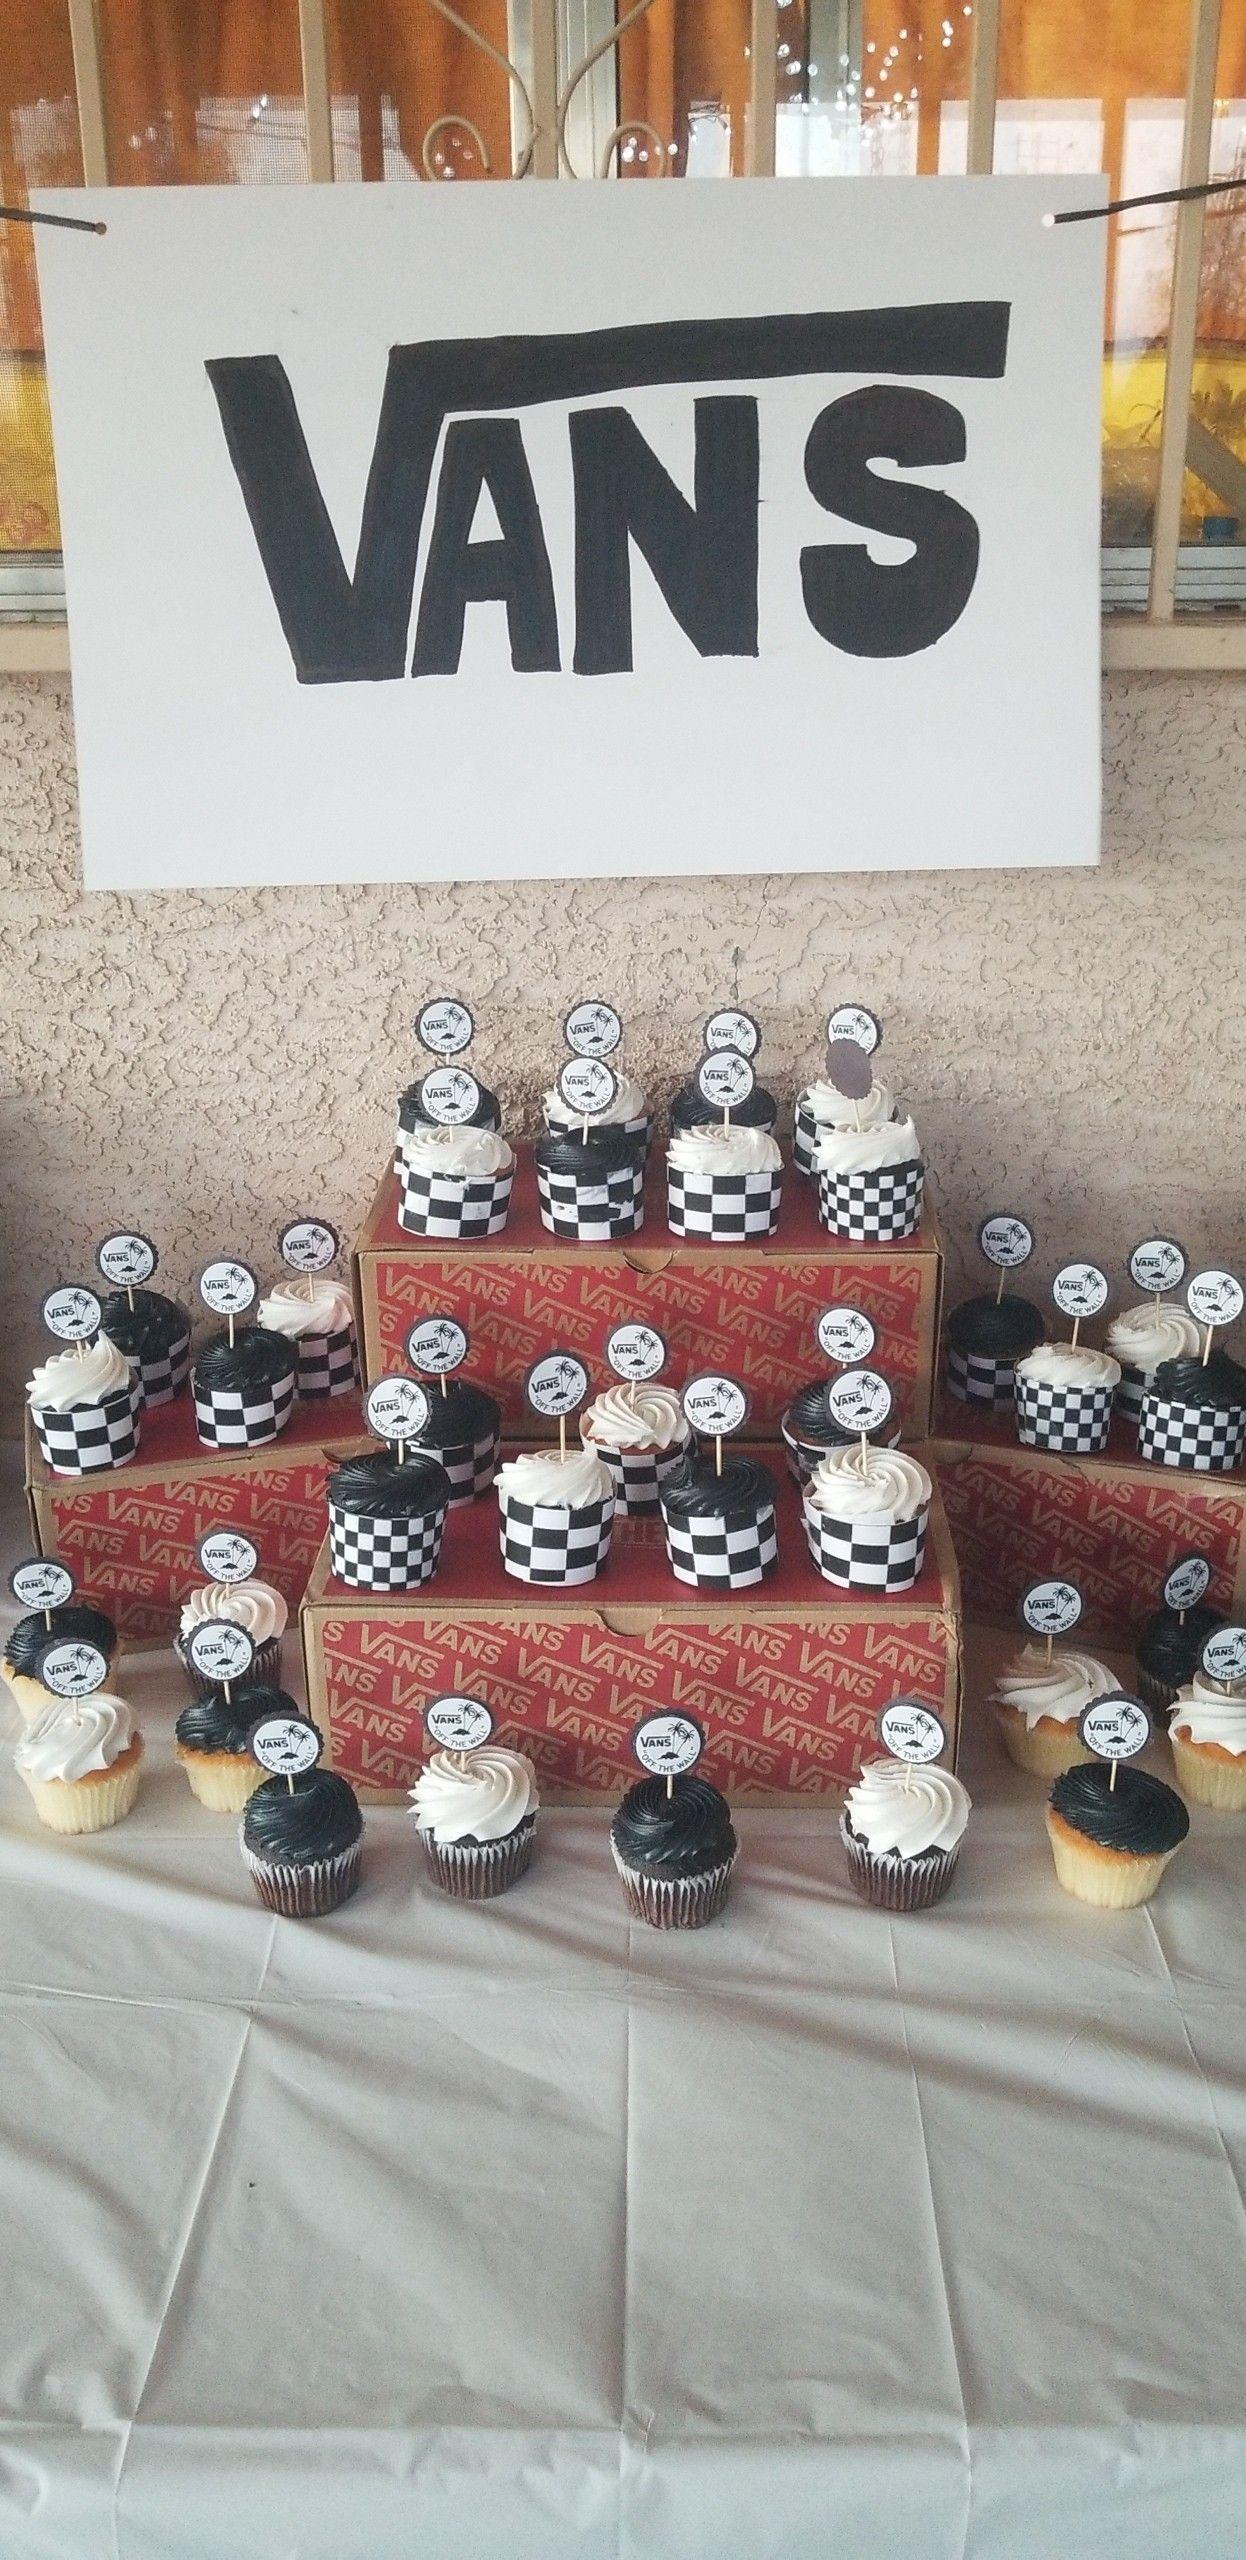 d8d7137801 Vans inspired cupcakes!